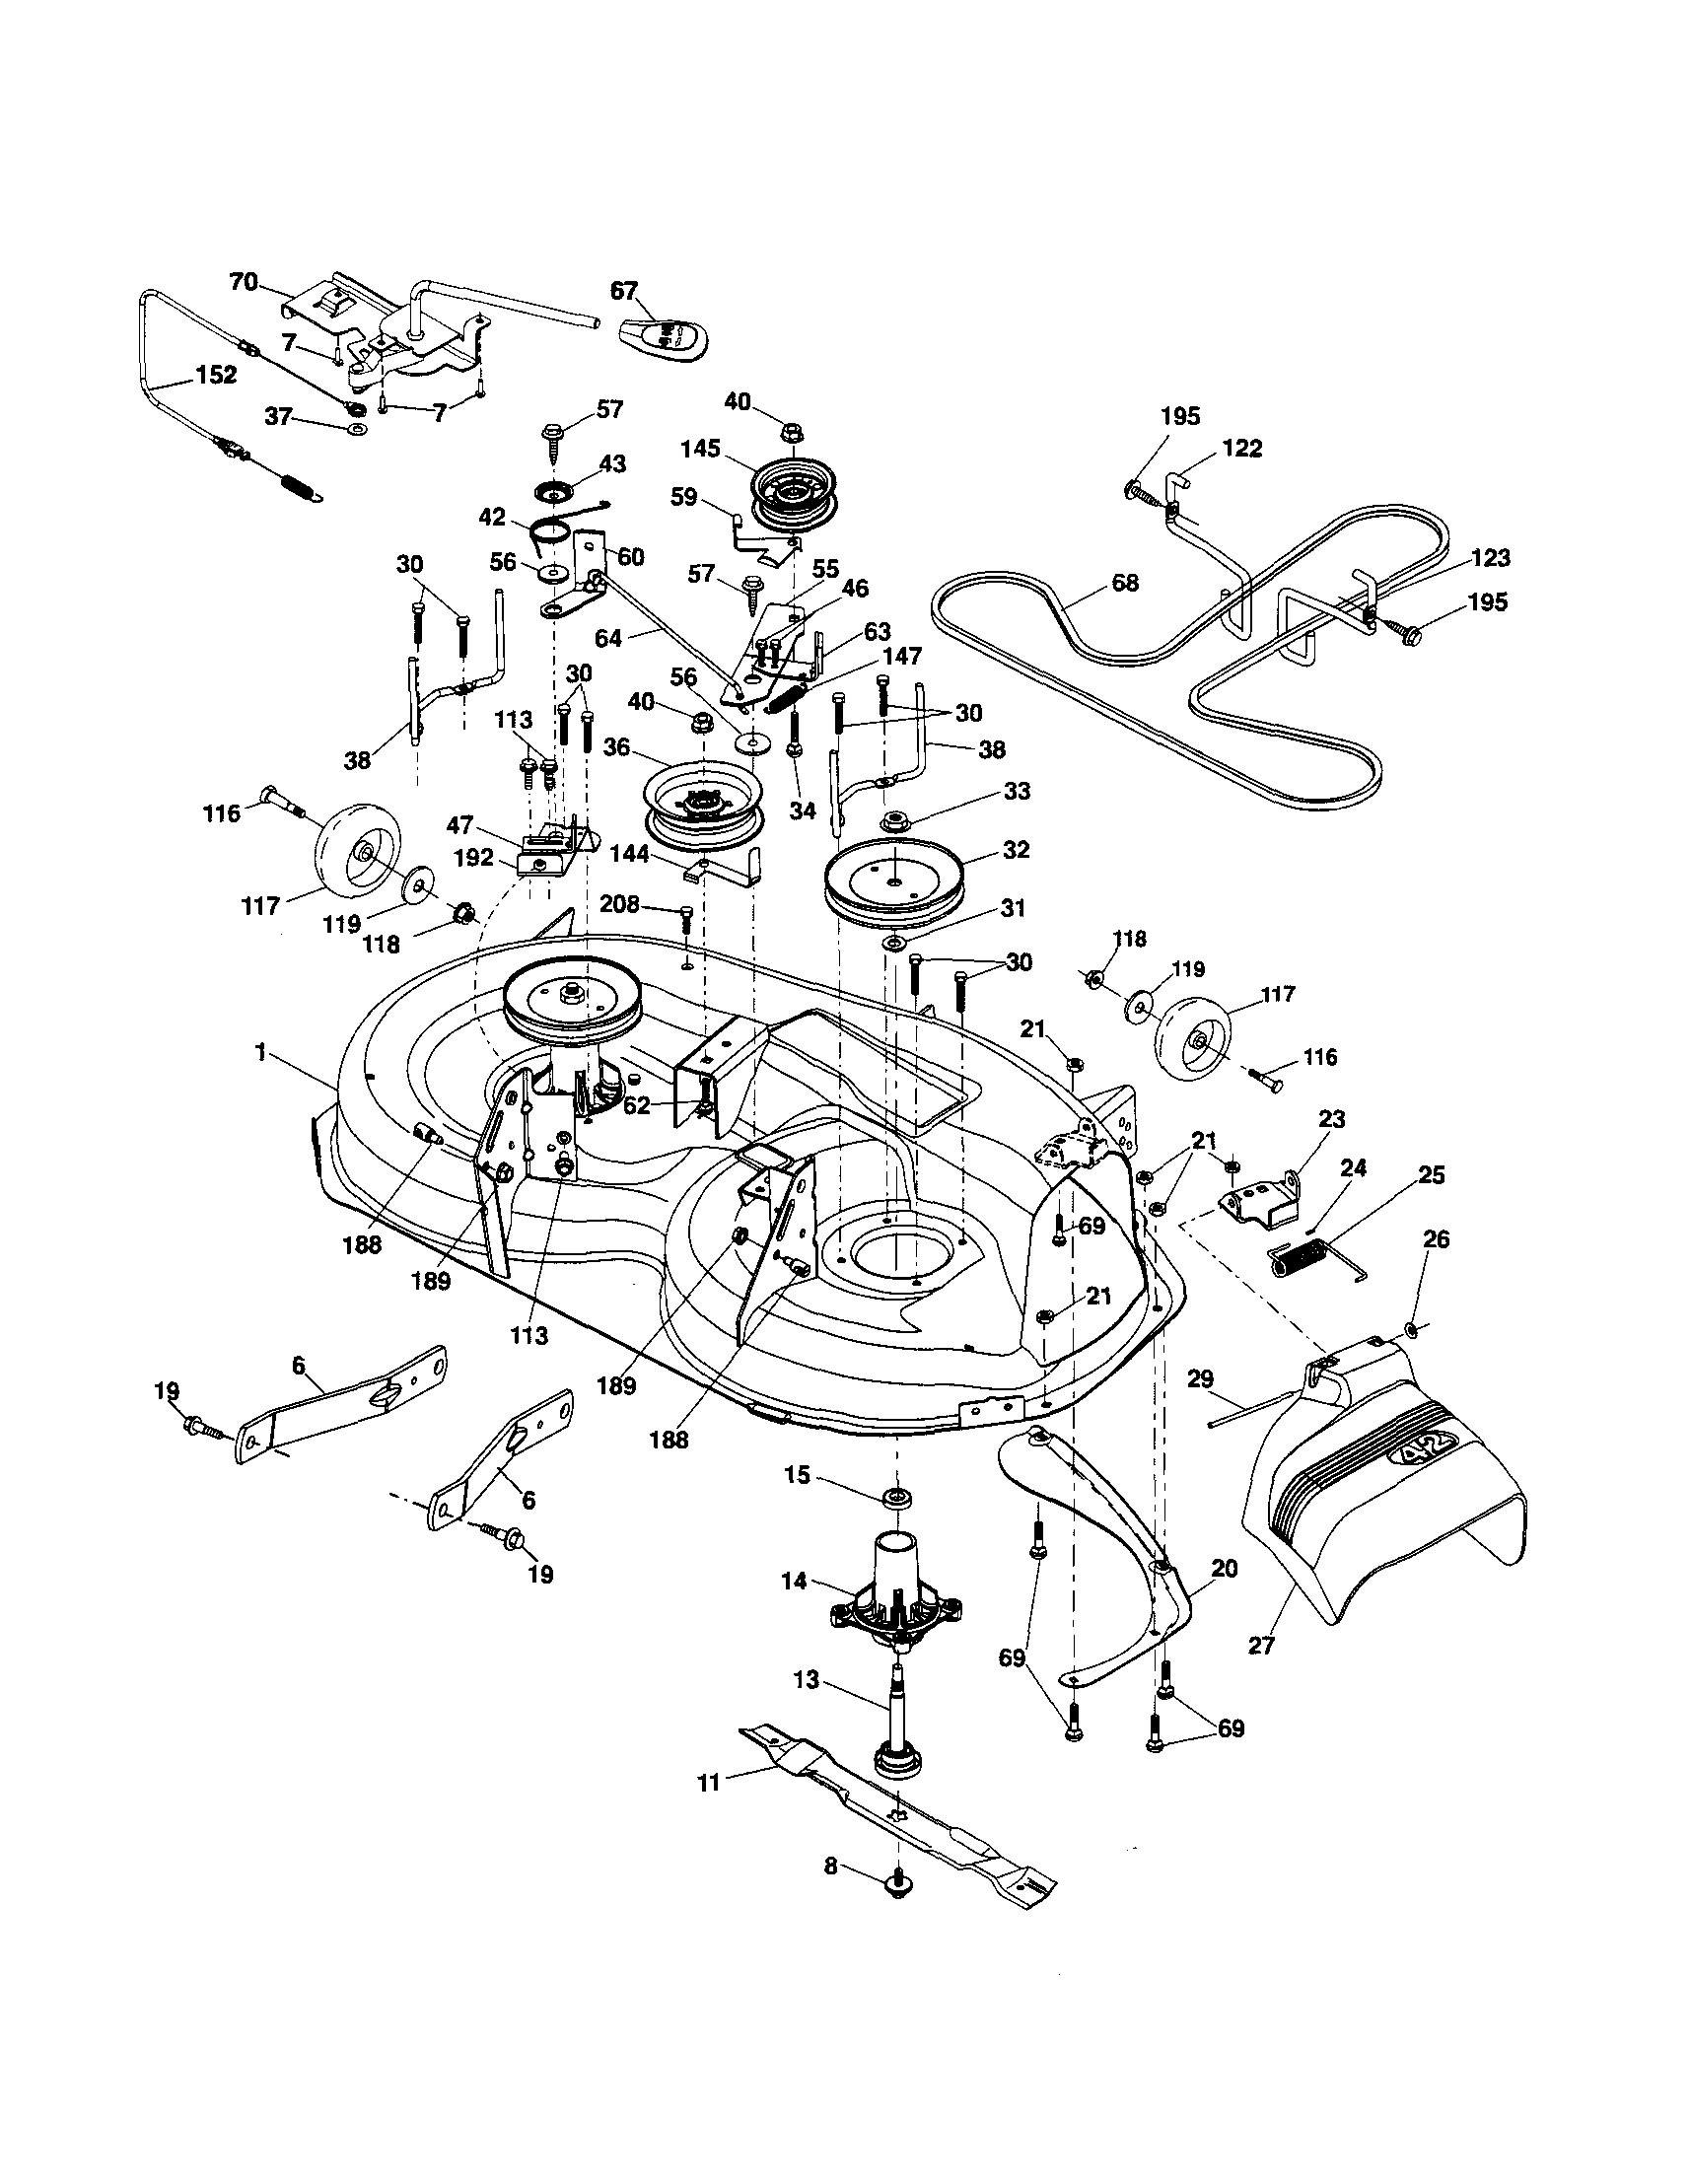 Ariens lawn mower parts diagram my wiring diagram ariens 927046 manual ariens lawn mower parts diagram